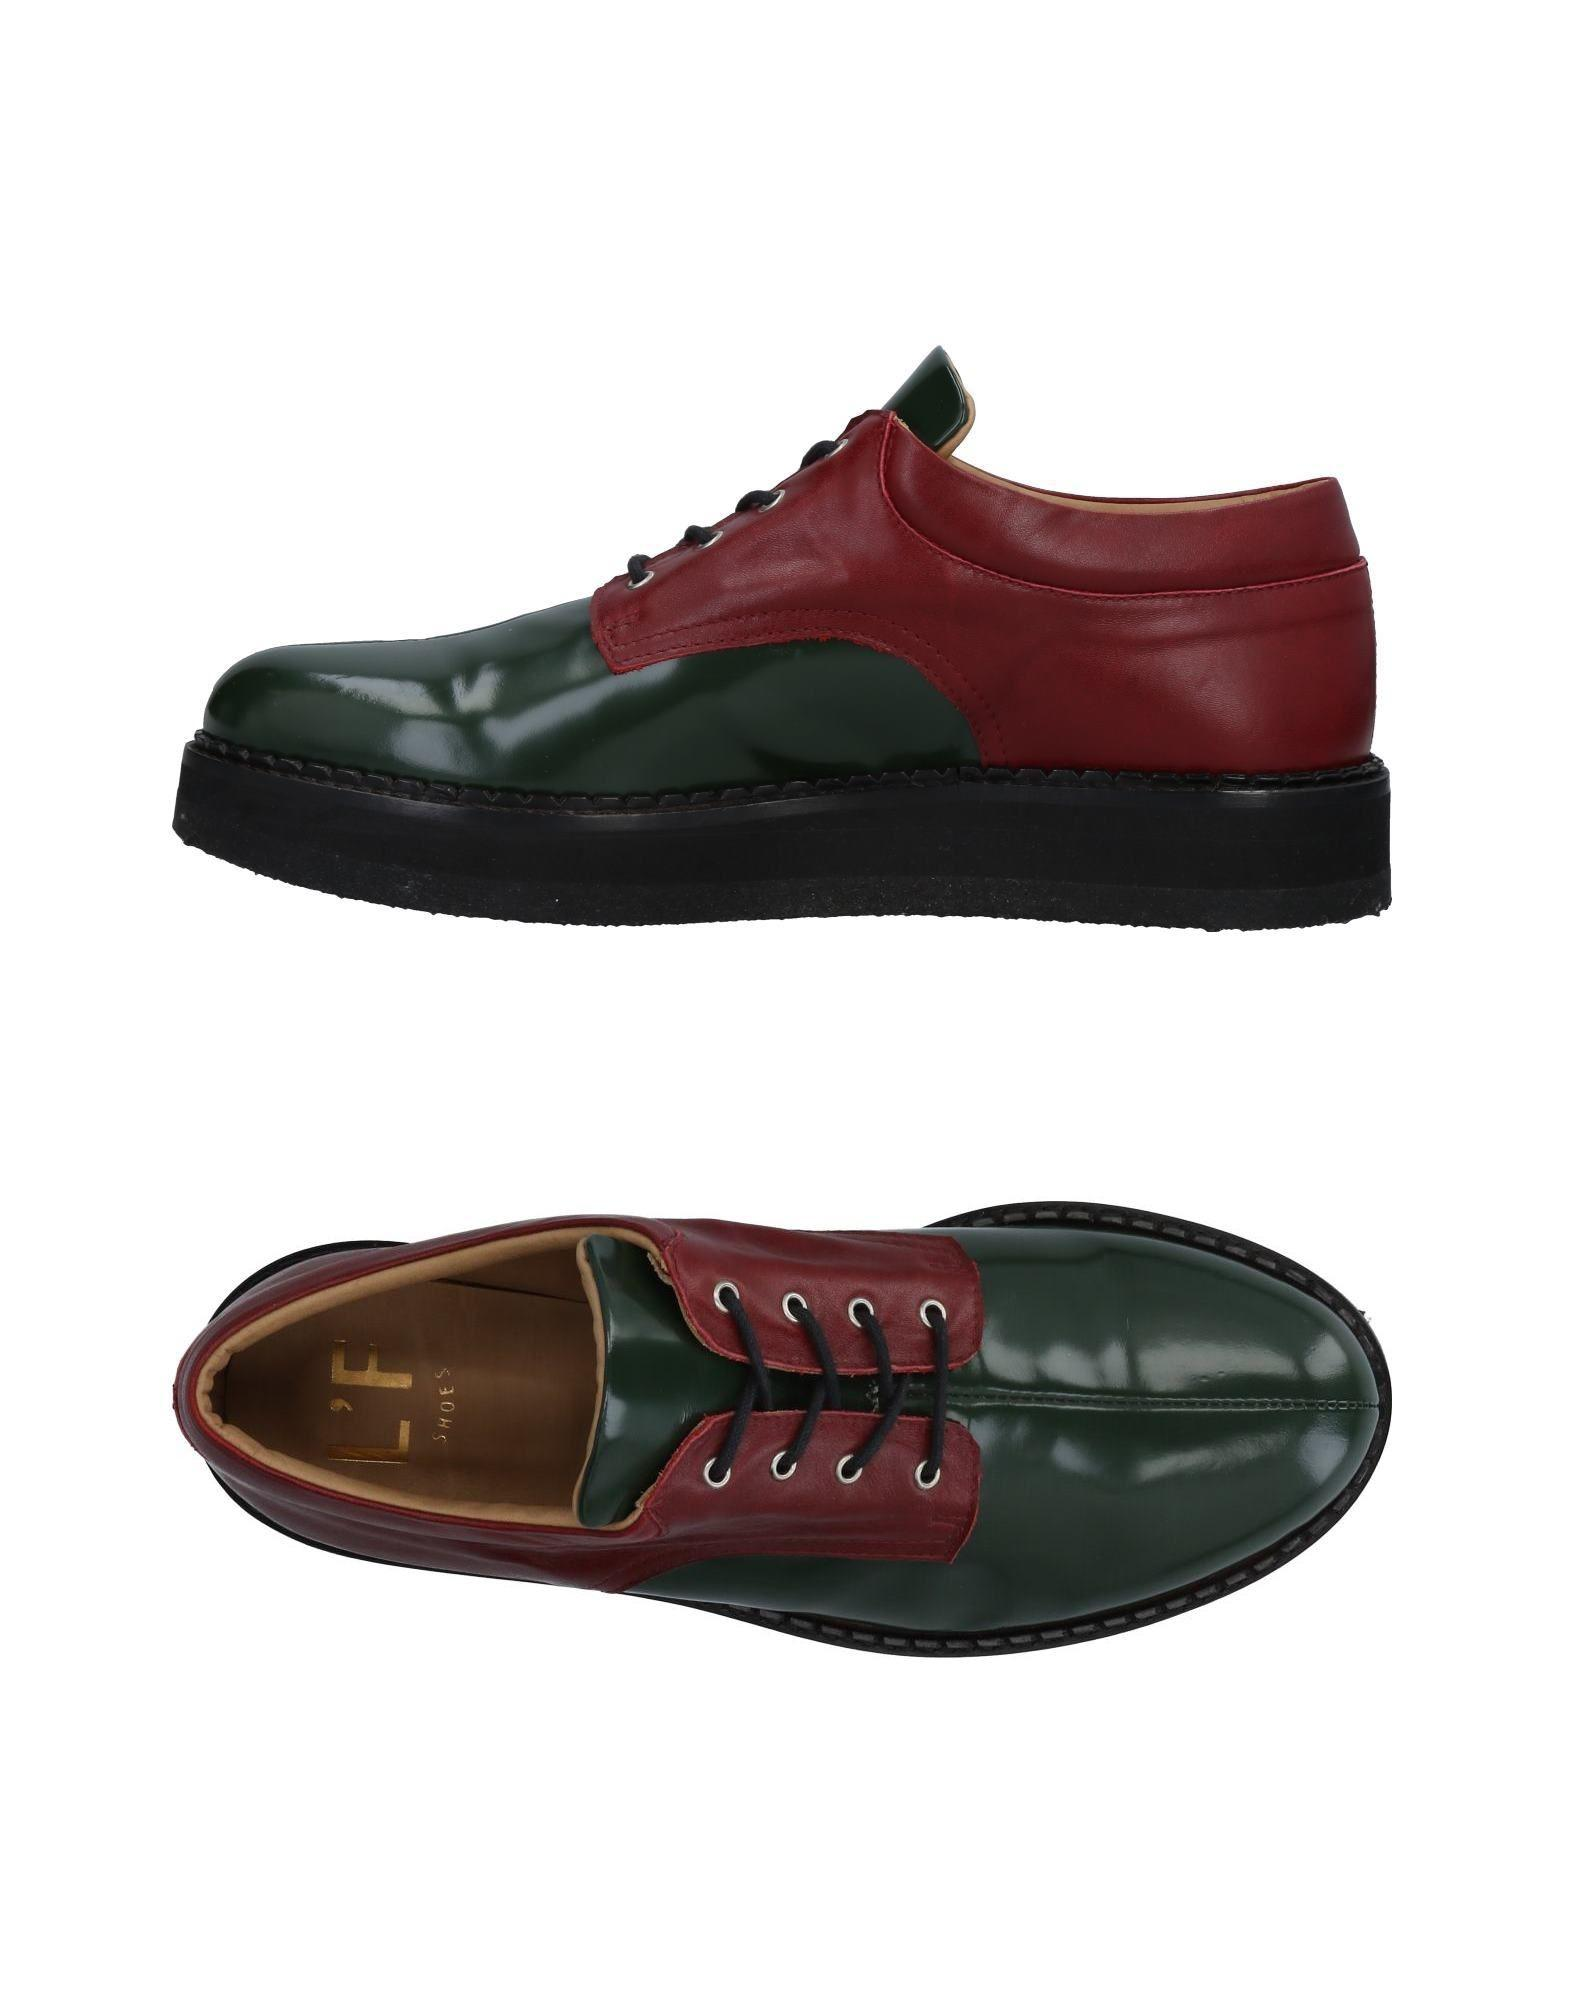 L'f Chaussures Chaussures À Lacets onf5Vawc